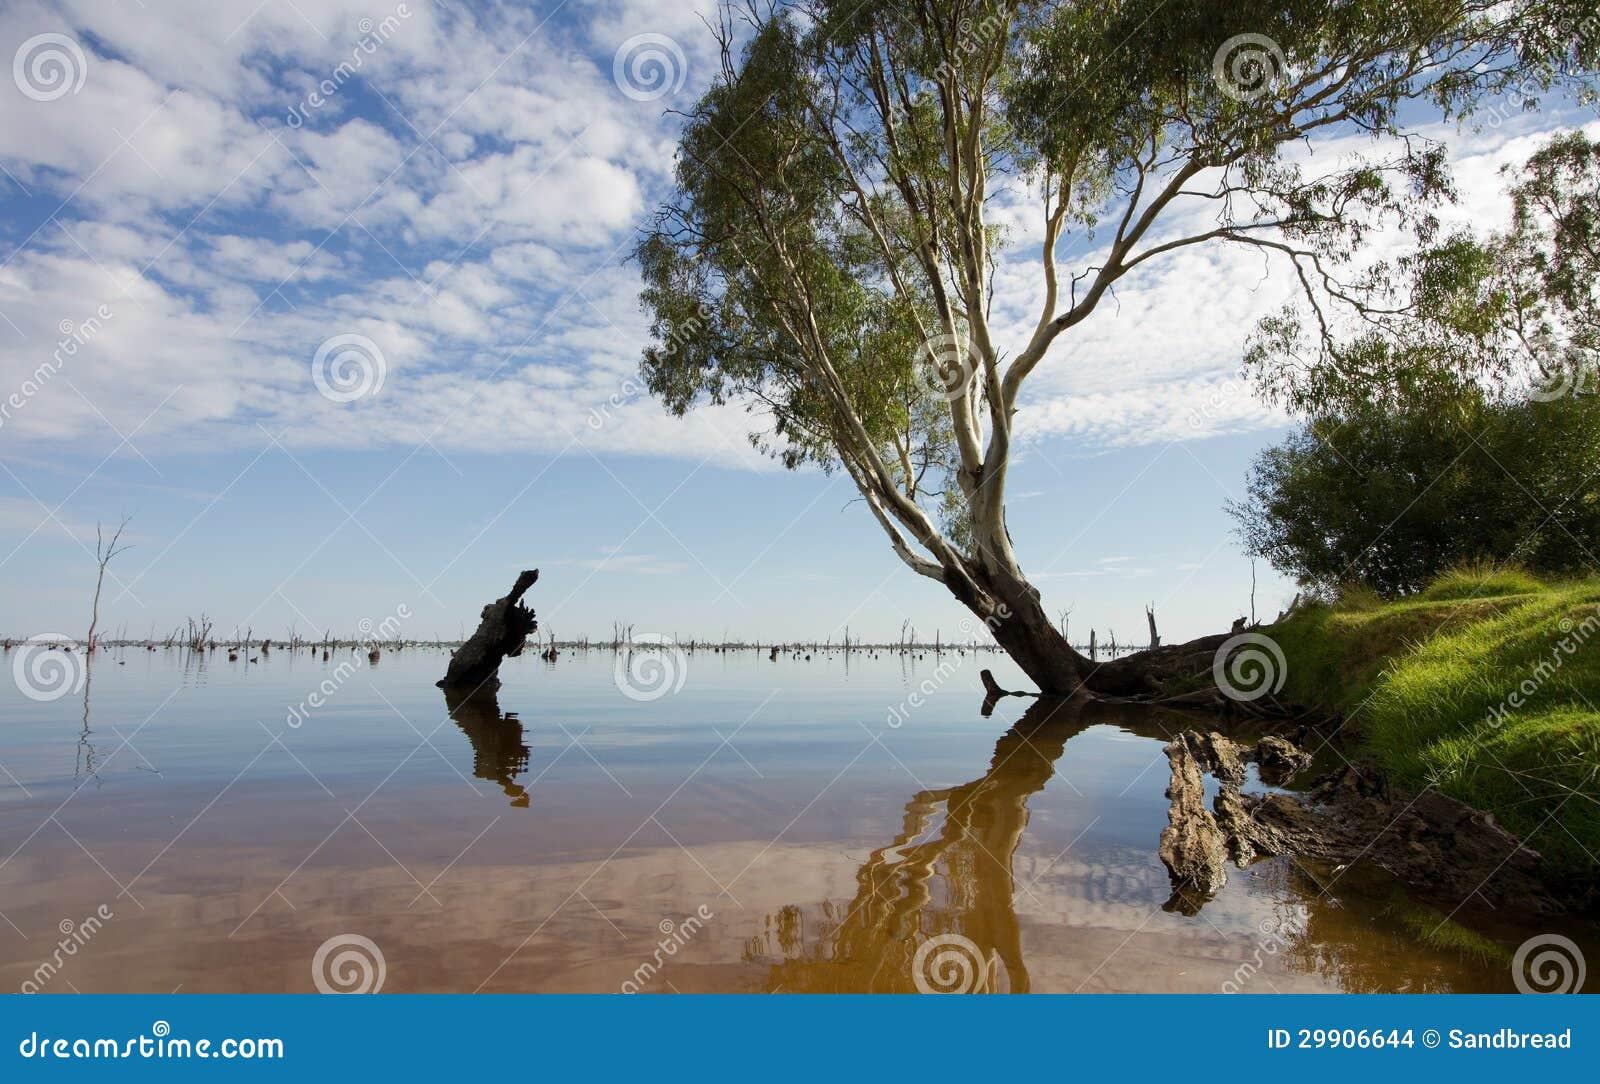 Mulwala Australia  City pictures : Gum Tree At Lake Mulwala, Australia Stock Images Image: 29906644